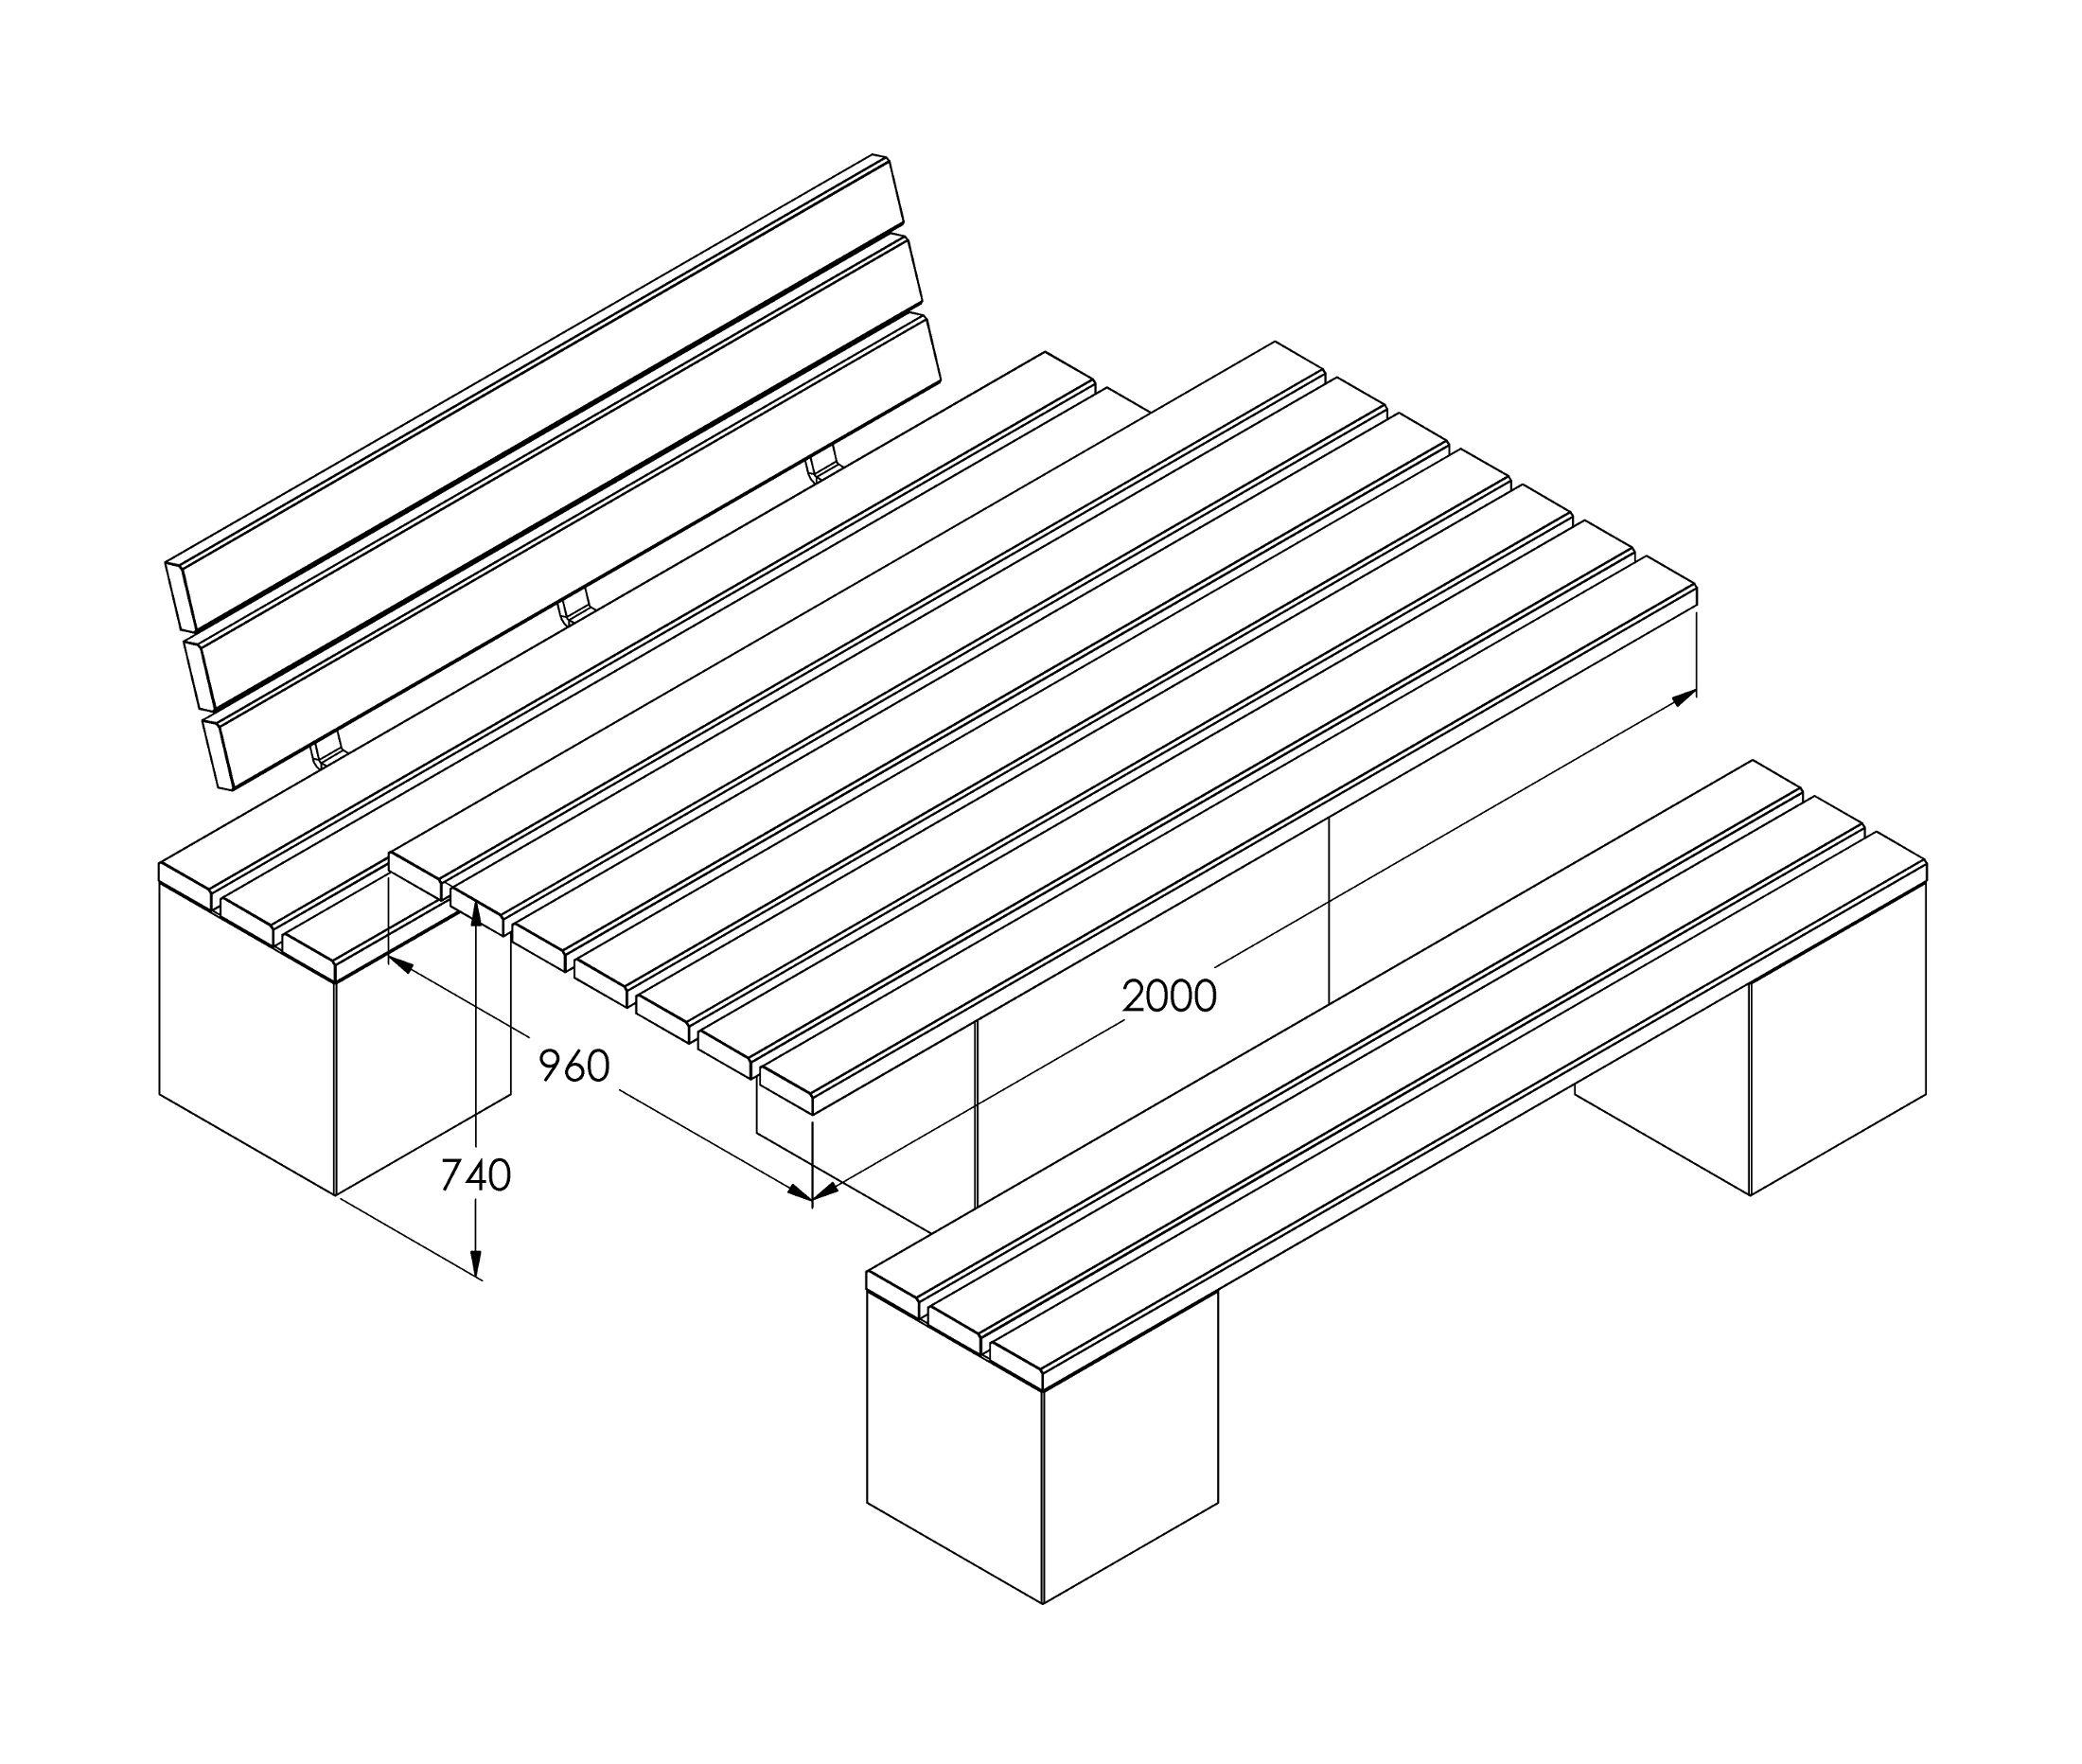 Massskizze_Quattro-Sitzgruppe-parallel-2200px